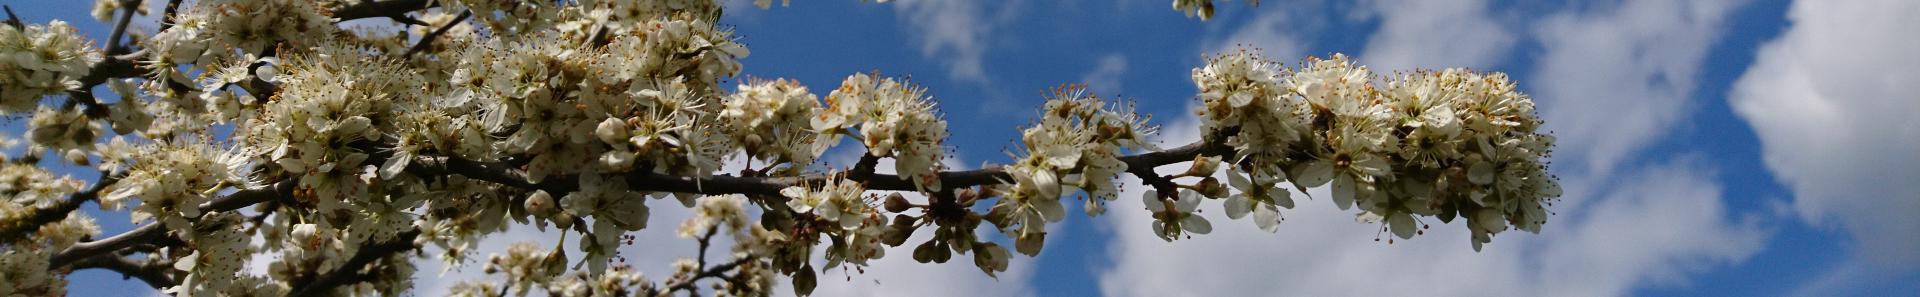 Banner Frühling Blüten